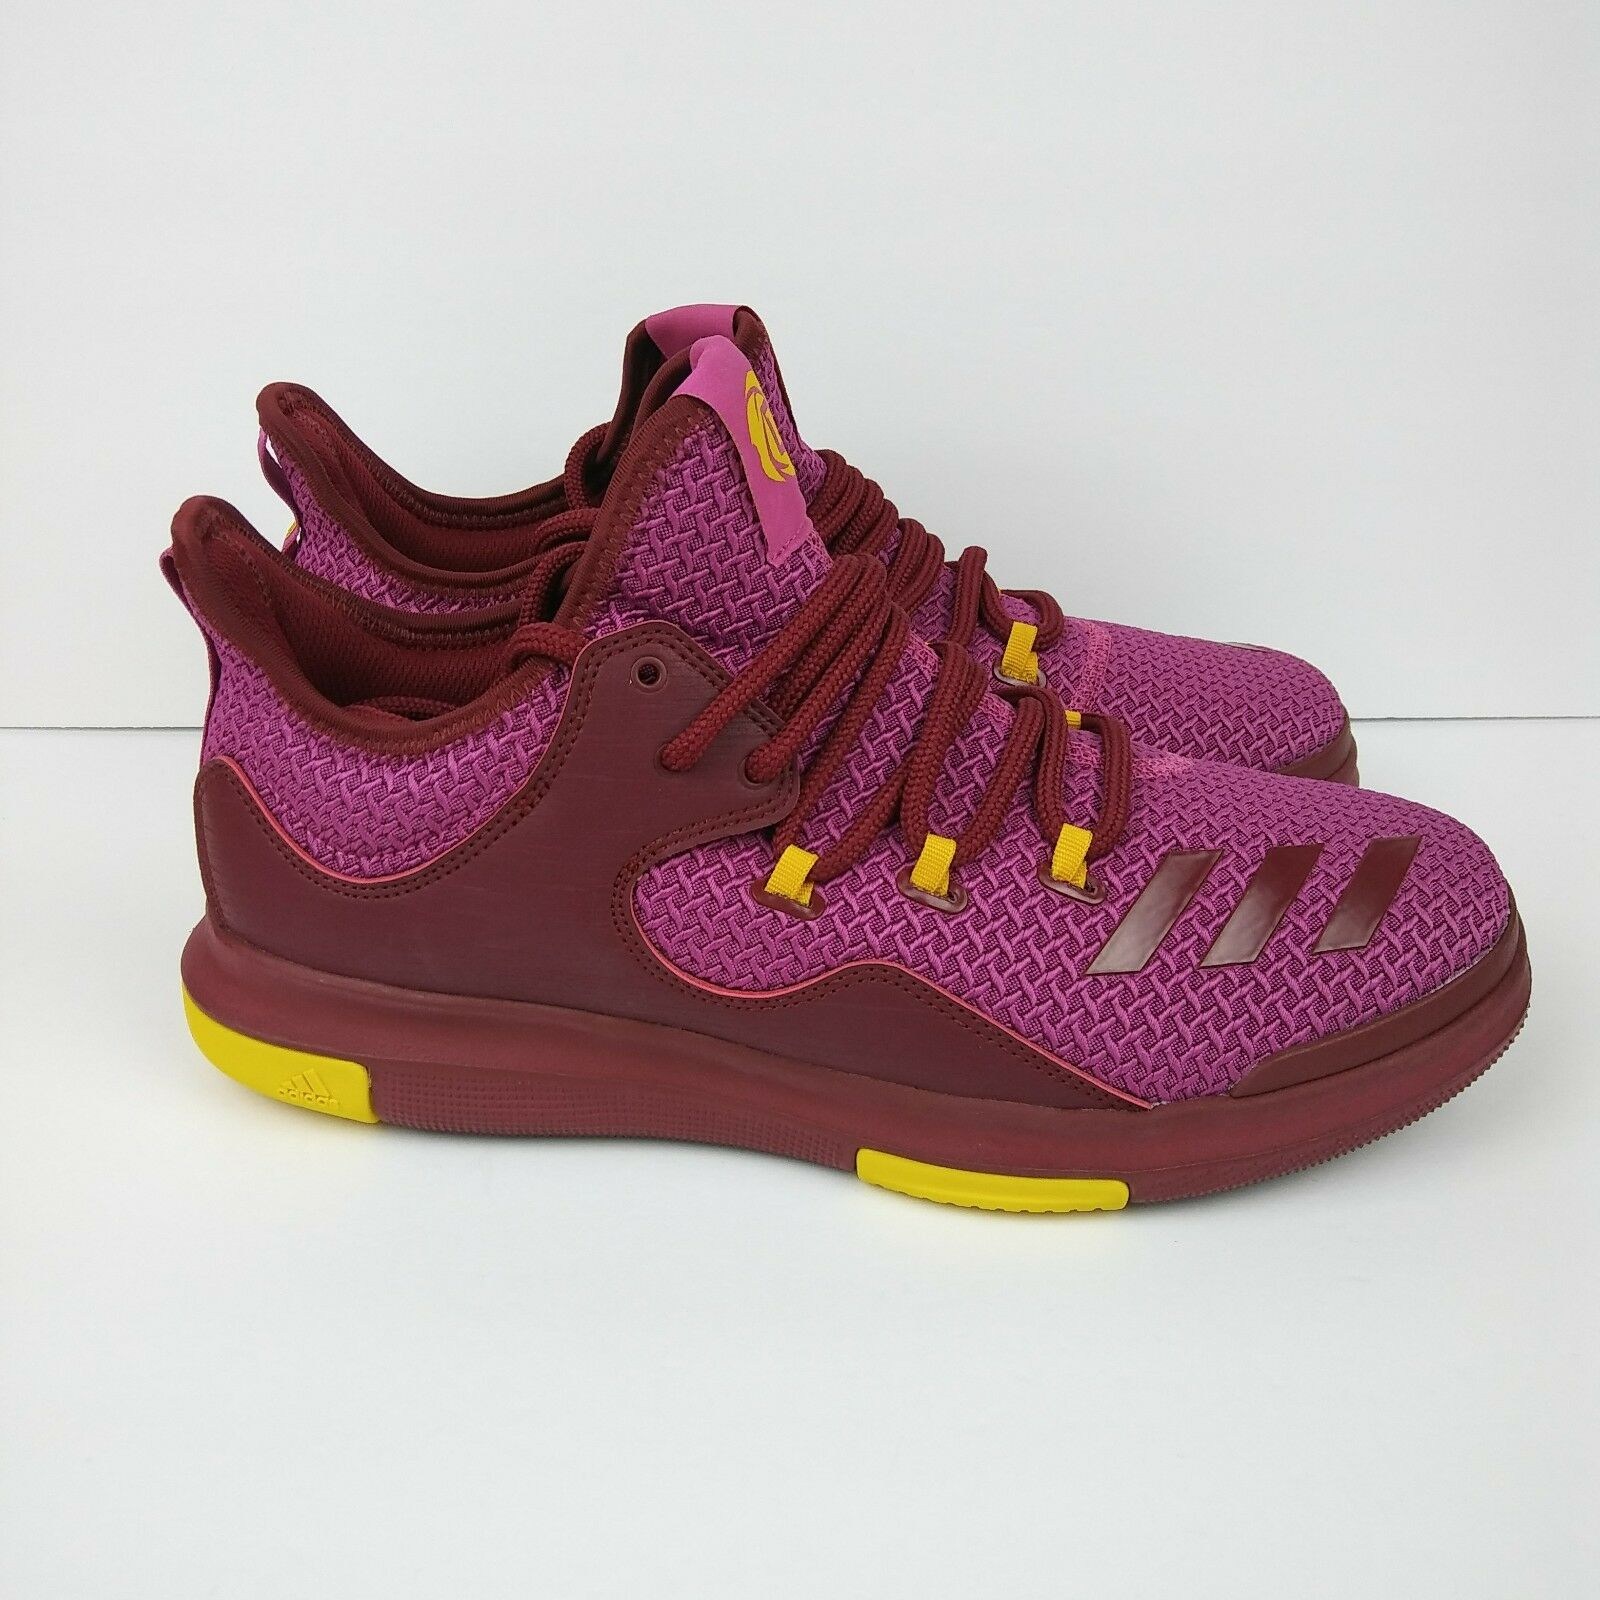 ADIDAS Rose Derrick D Rose ADIDAS Basketball Chaussures hommes a24c3f